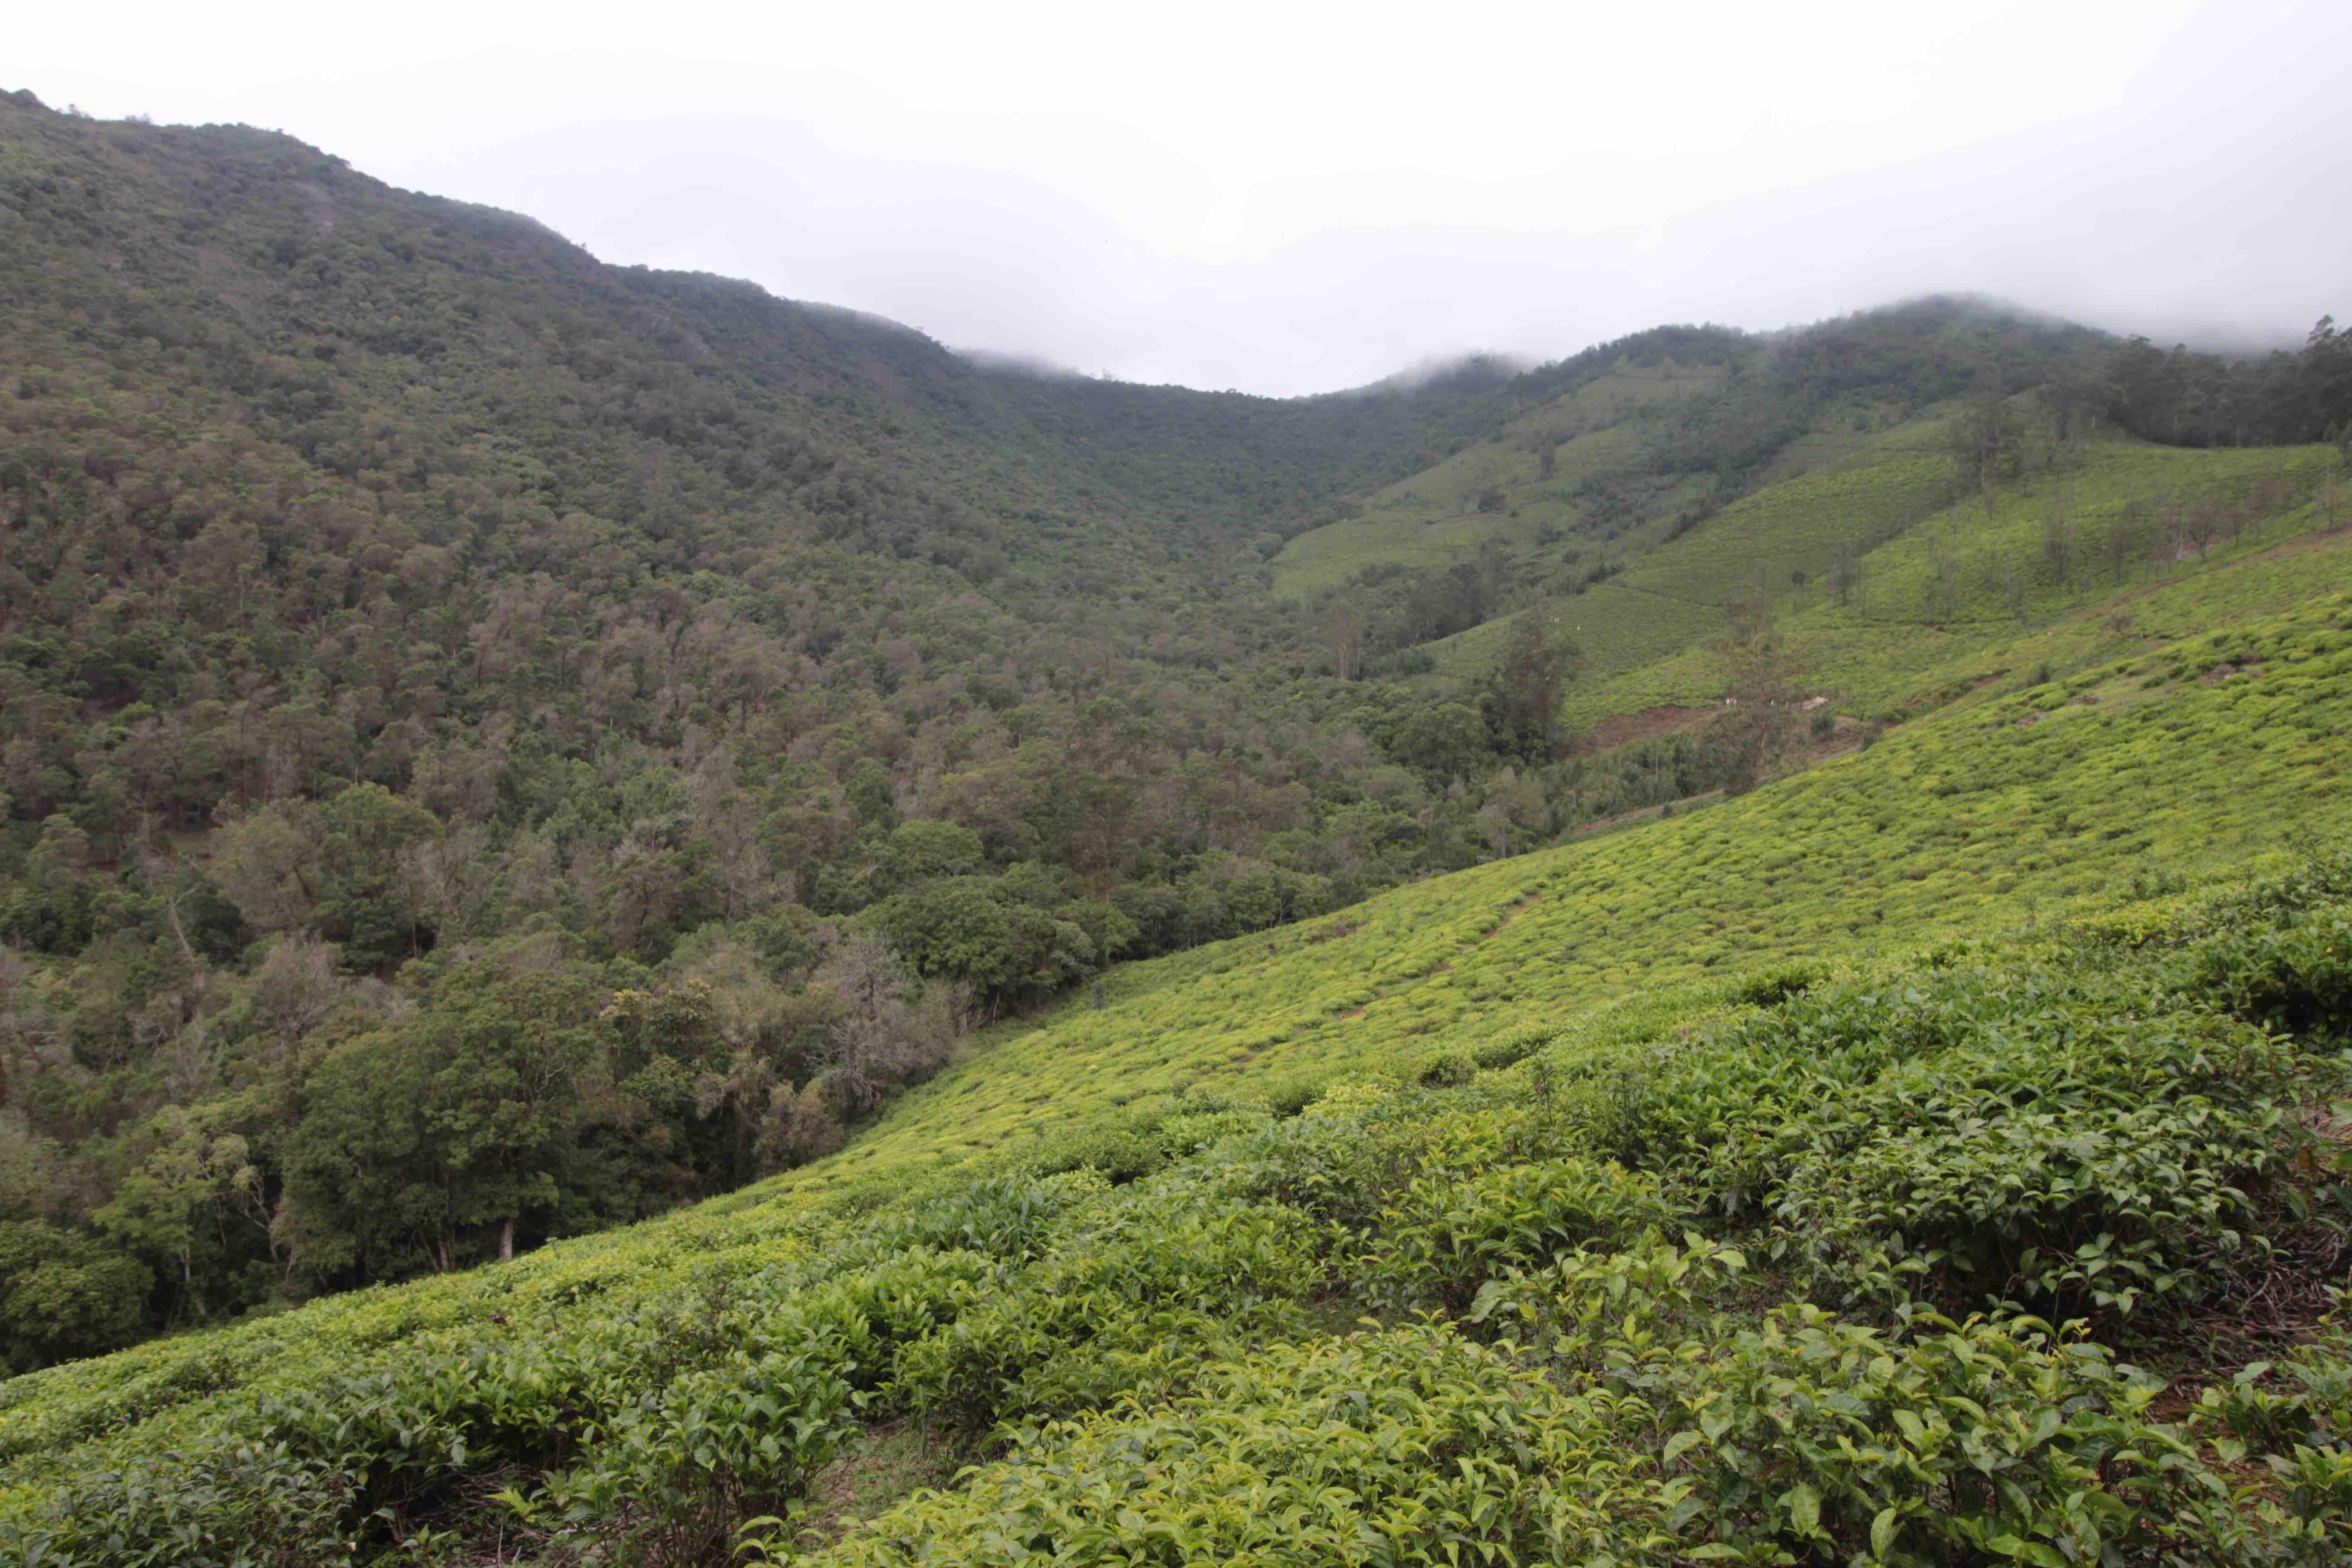 The Nilgiris landscape with tea estates, exotic plants, shola forests and patches of grassland. Credit: Sibi Arasu.